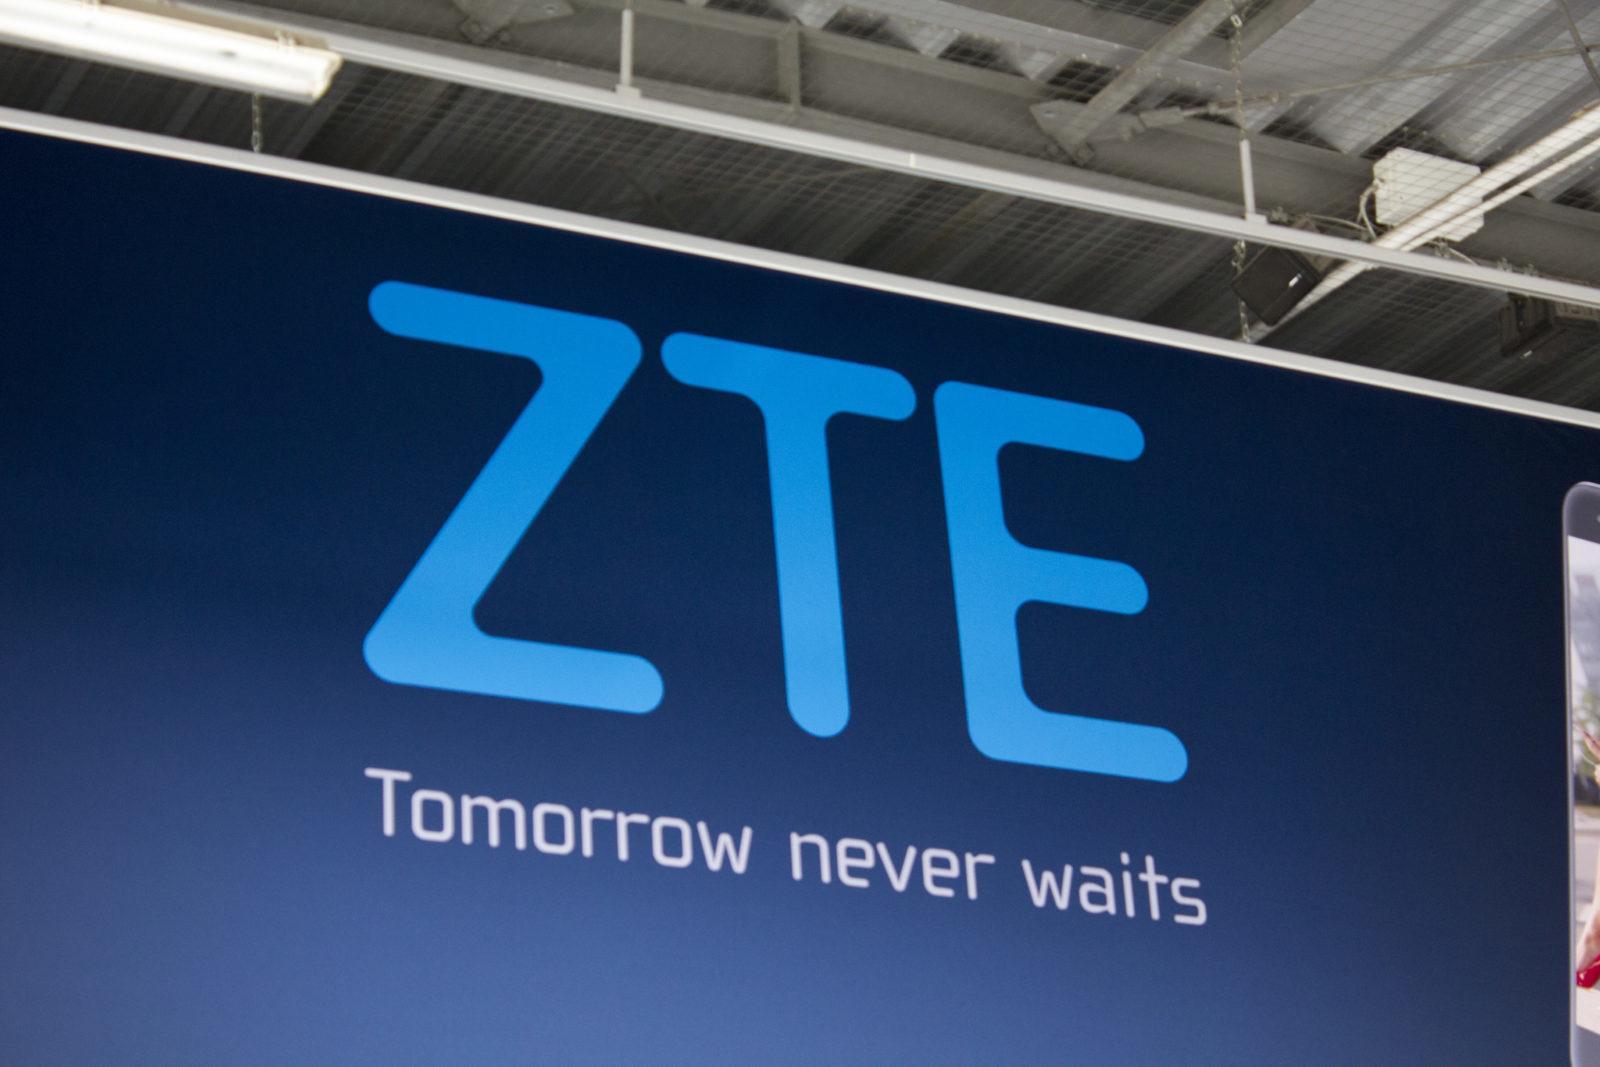 Смартфон ZTE Blade V7 Plus - еще одна удачная новинка от компании ZTE